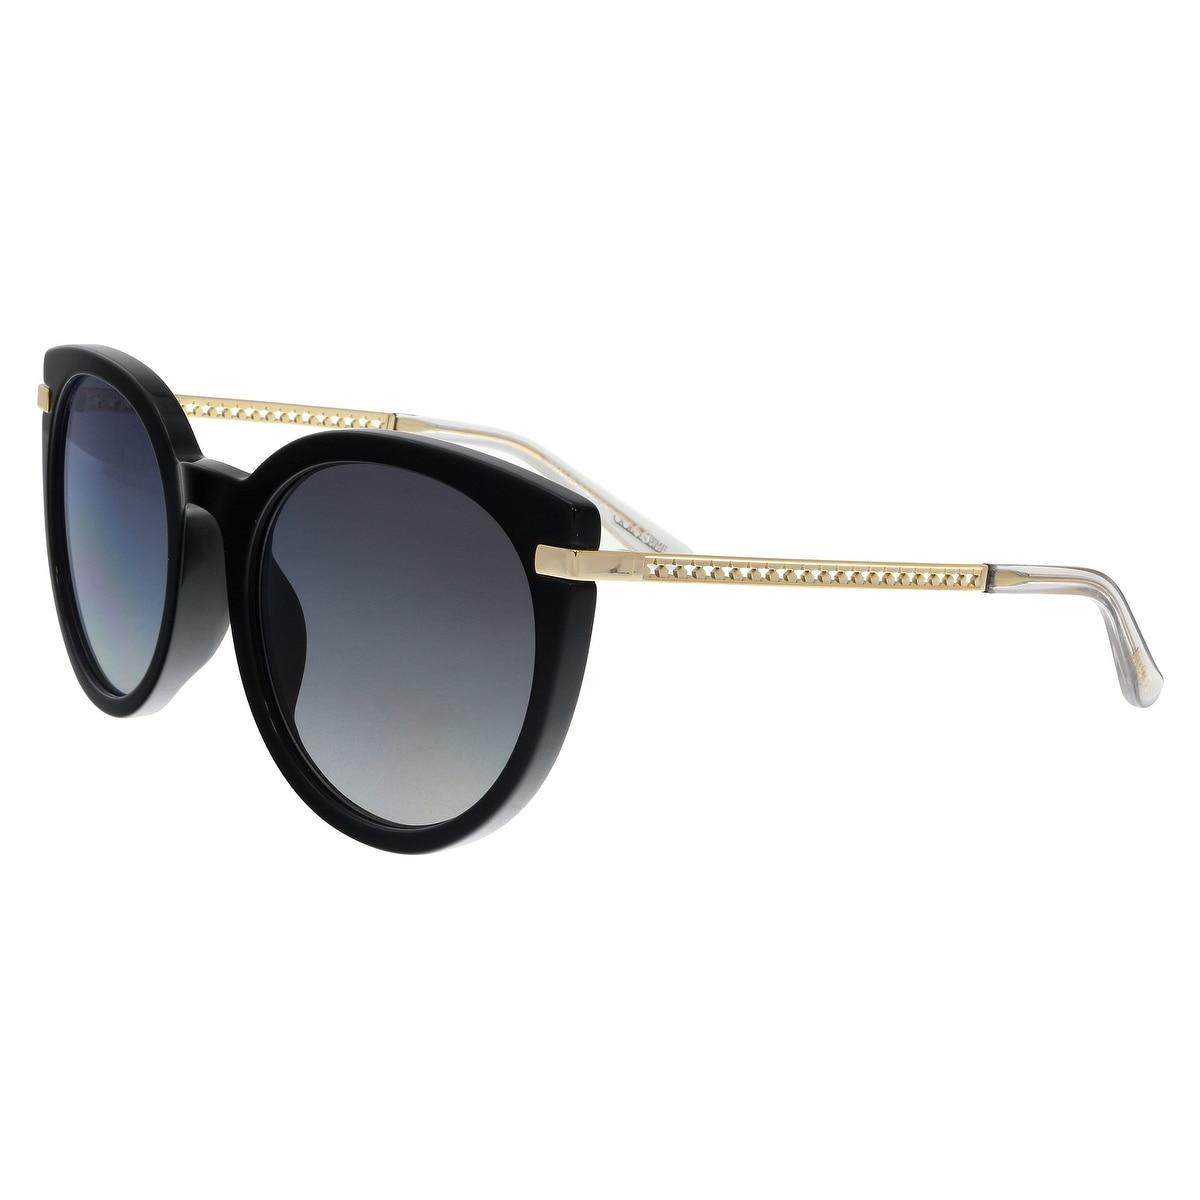 ca5da58367b Shop Jimmy Choo DENA F S 807 Black Round Sunglasses - no size - Free ...